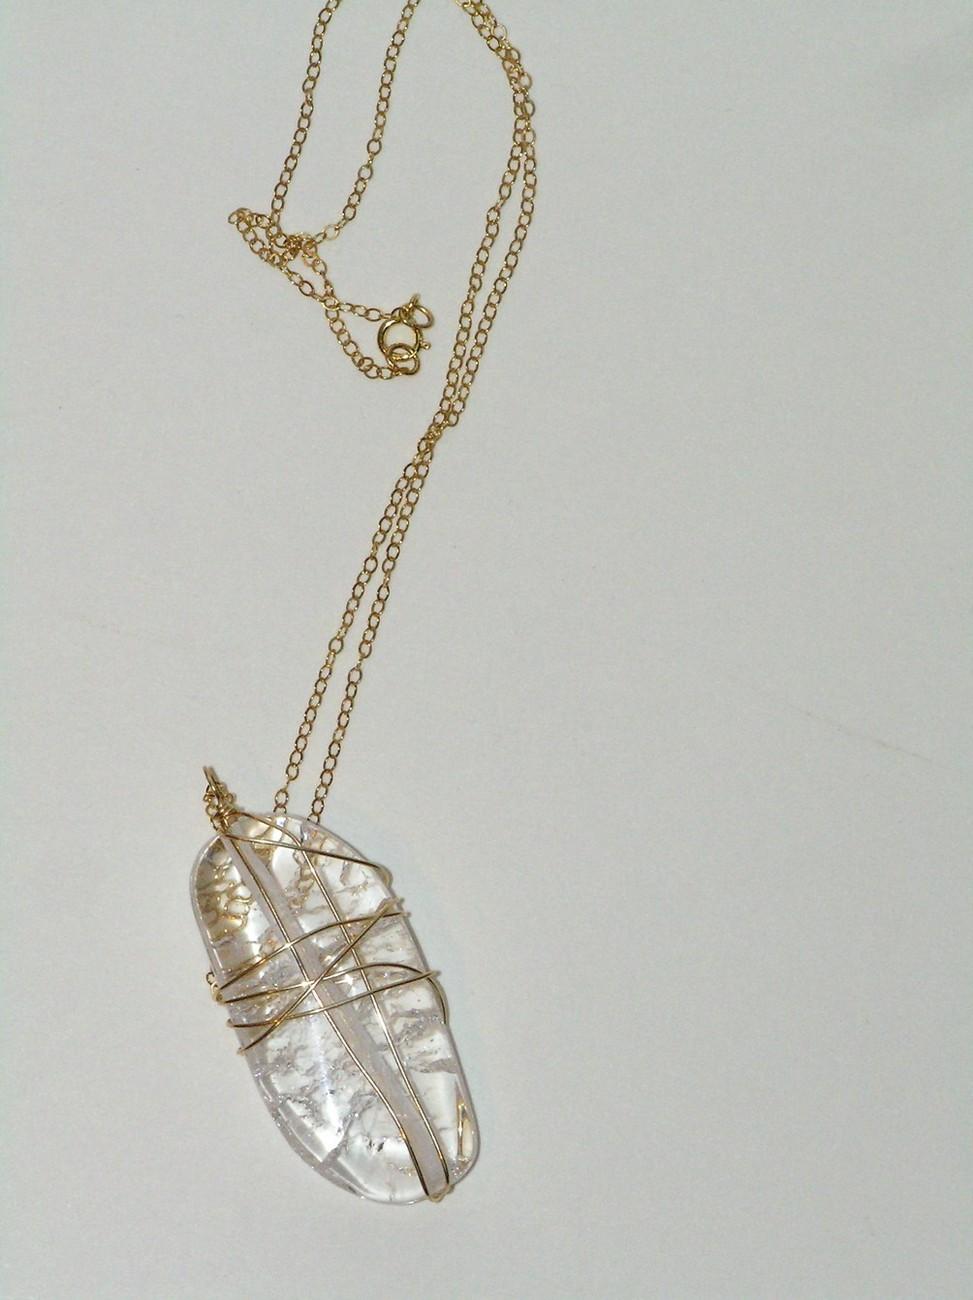 Gold Crackled Quartz Wrapped Necklace